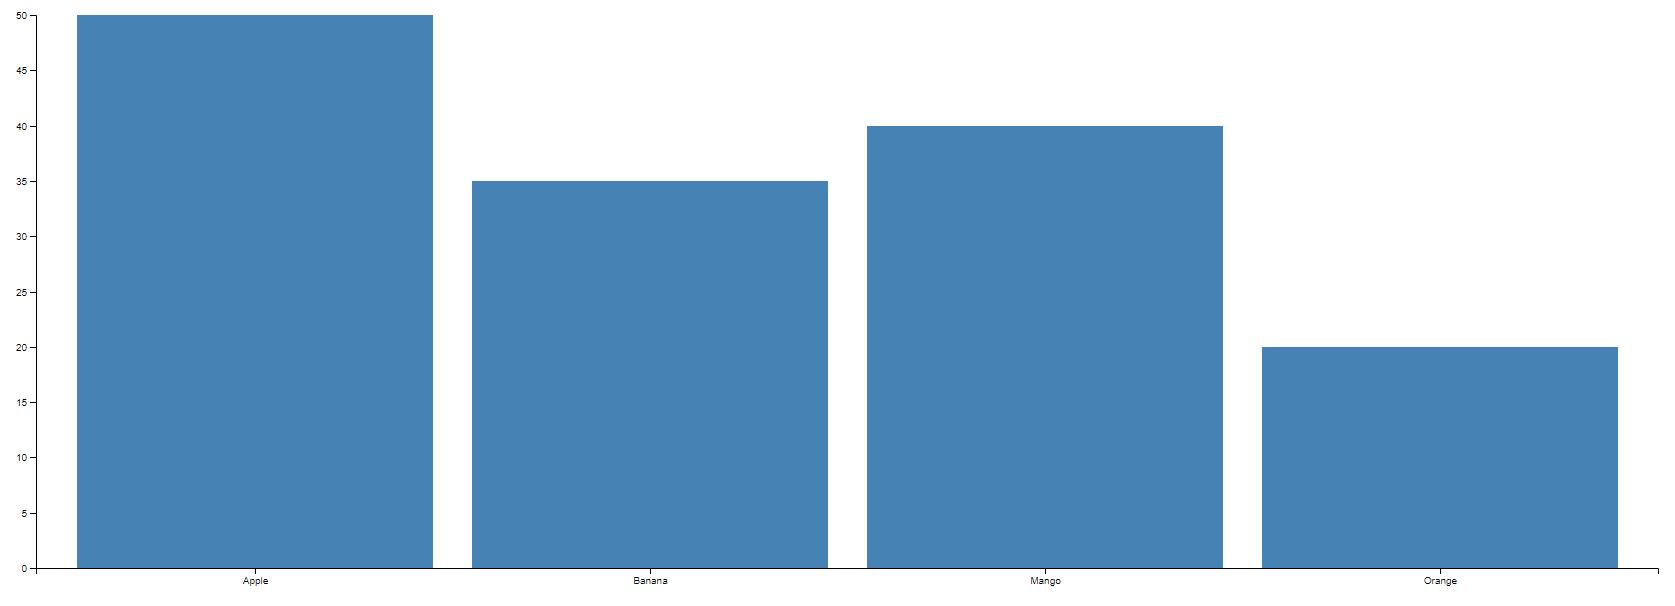 How to create a basic bar chart in SAS Visual Anal    - SAS